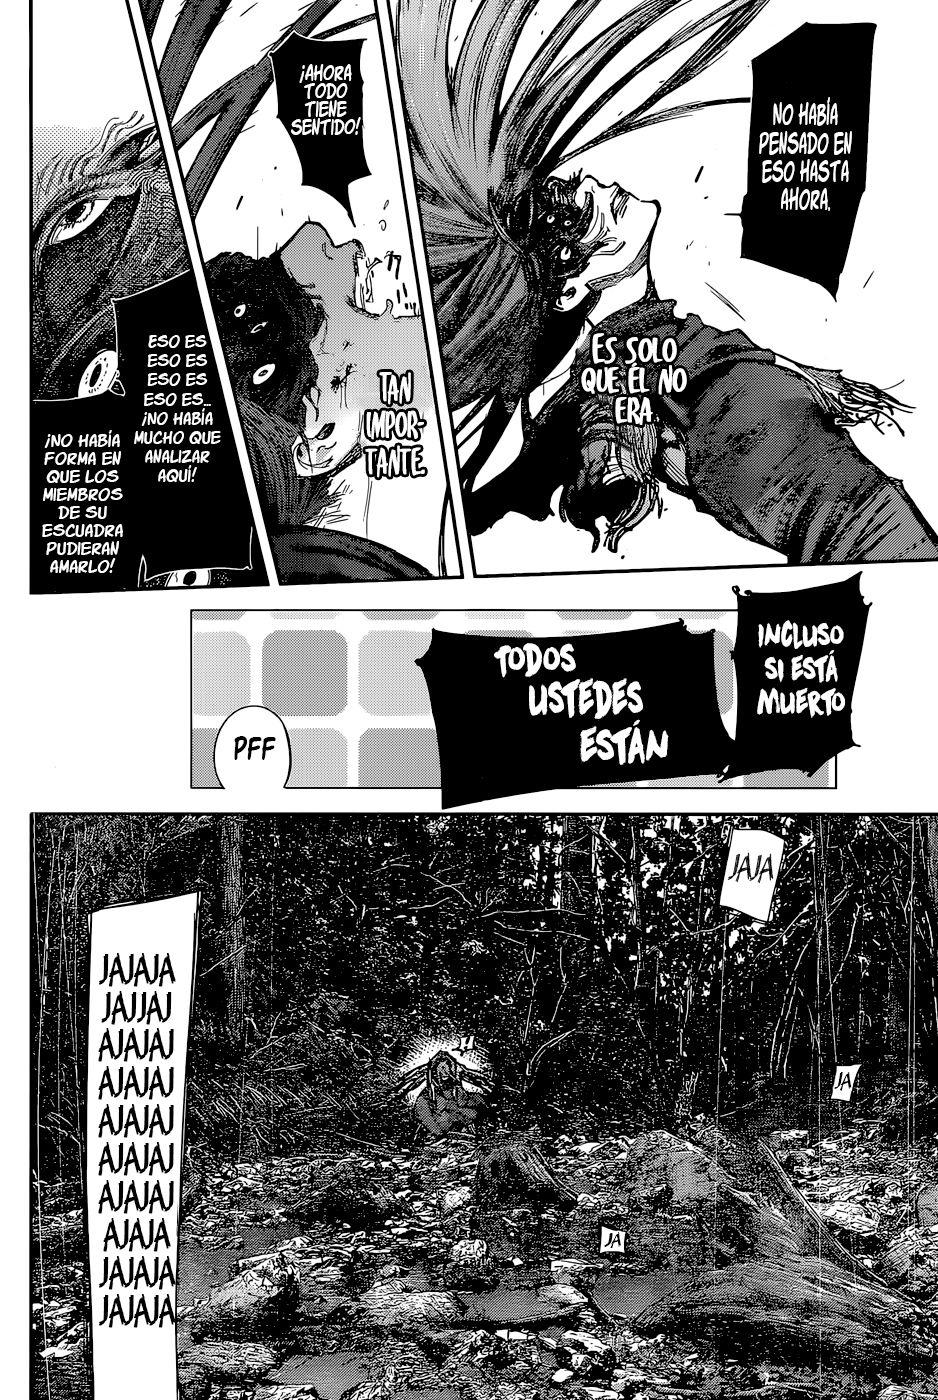 http://c5.ninemanga.com/es_manga/59/59/486951/6358390c66d2575ac3607502a92e34af.jpg Page 7